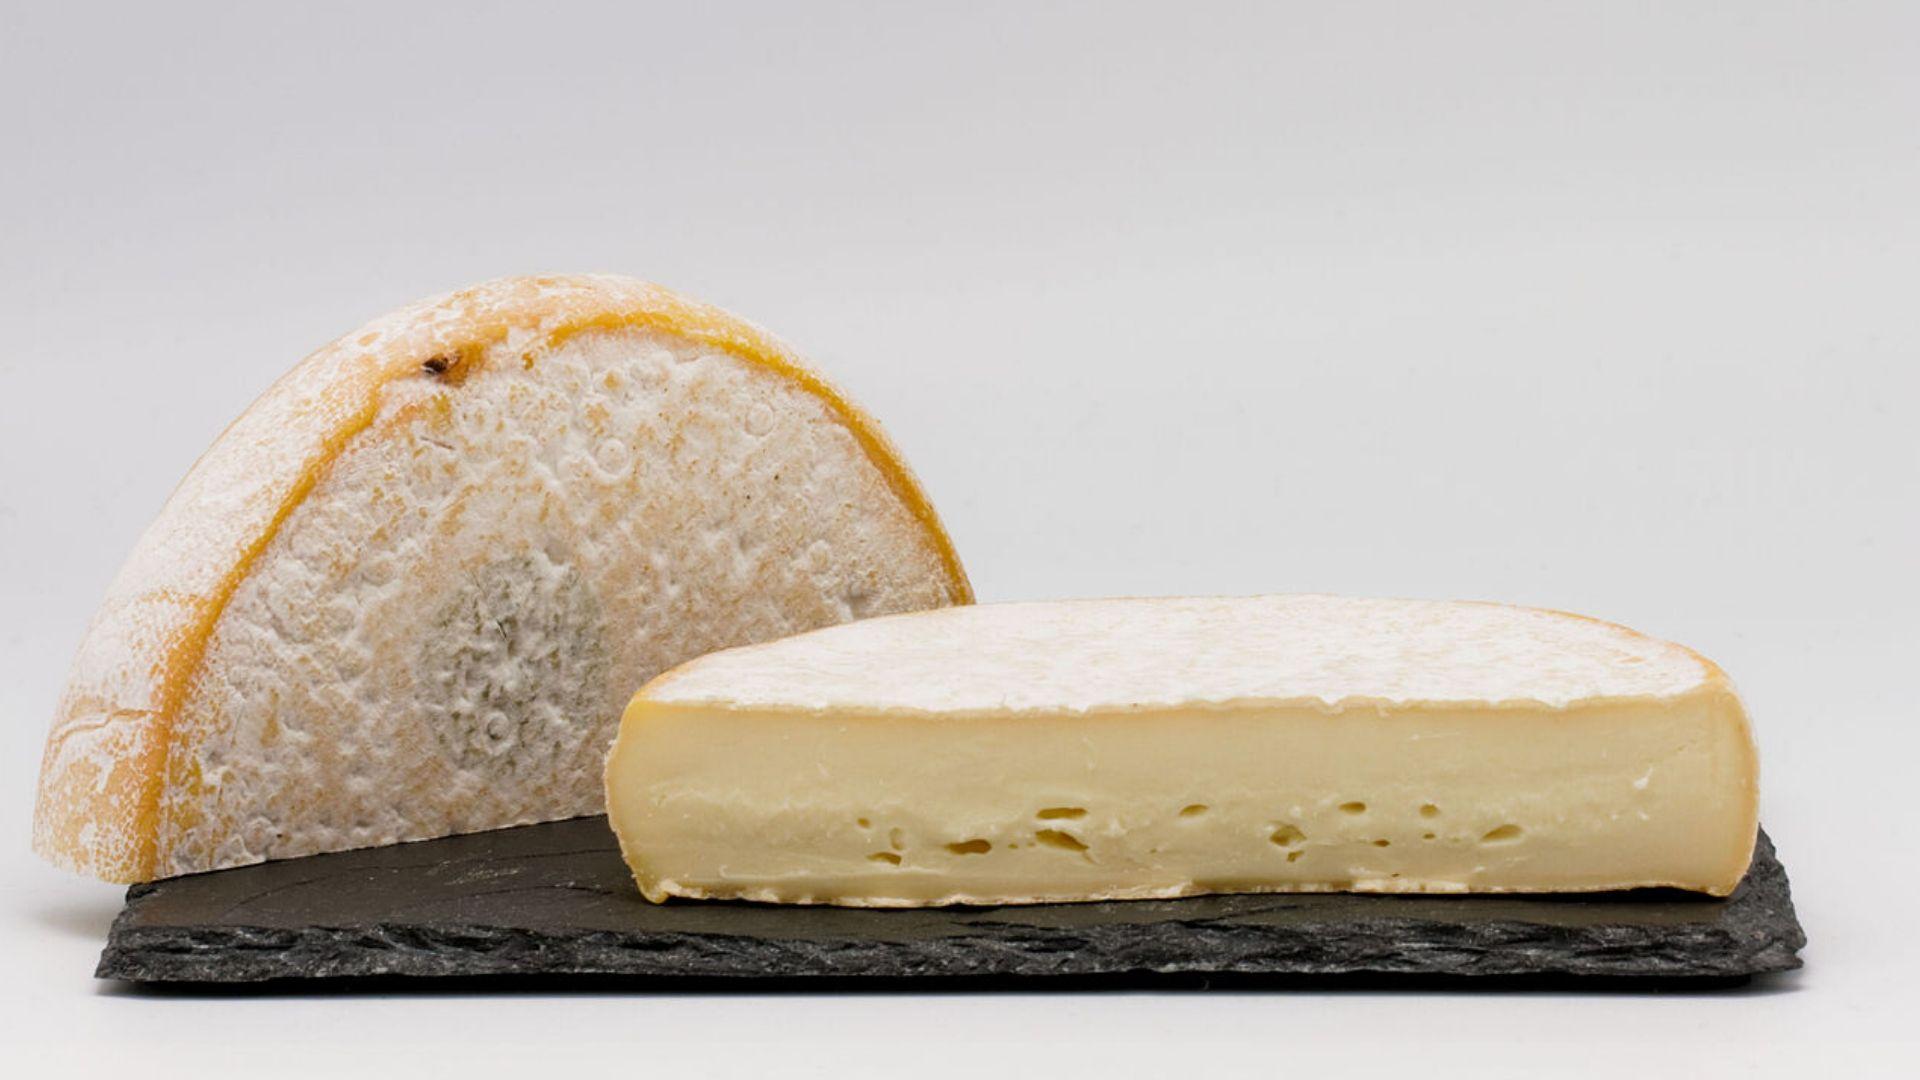 reblochon Francuskie śmierdzące sery pleśniowe: